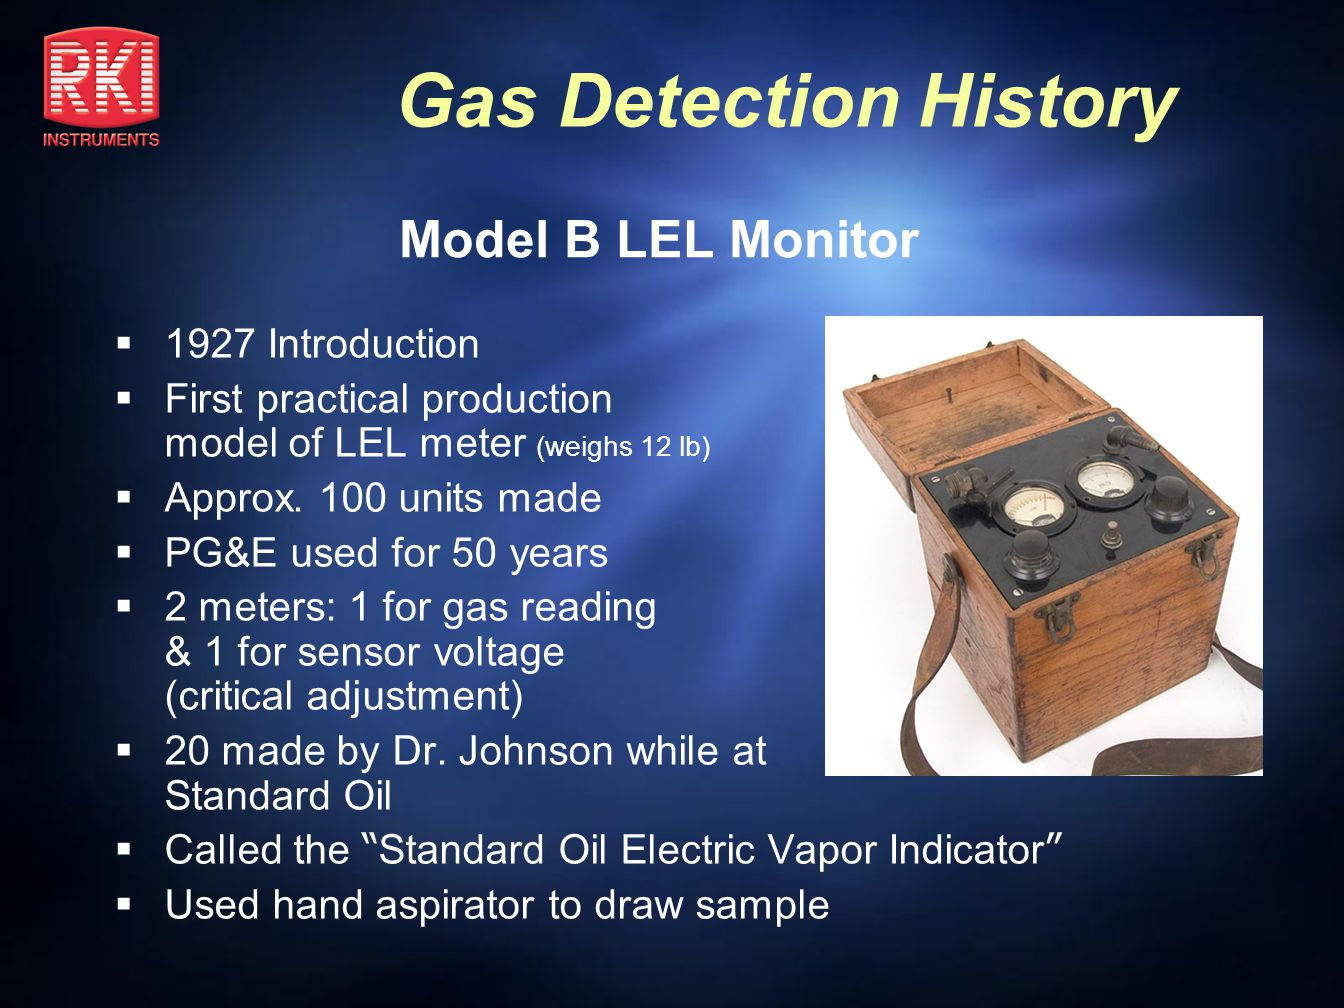 Model B LEL Monitor 1927 Introduction